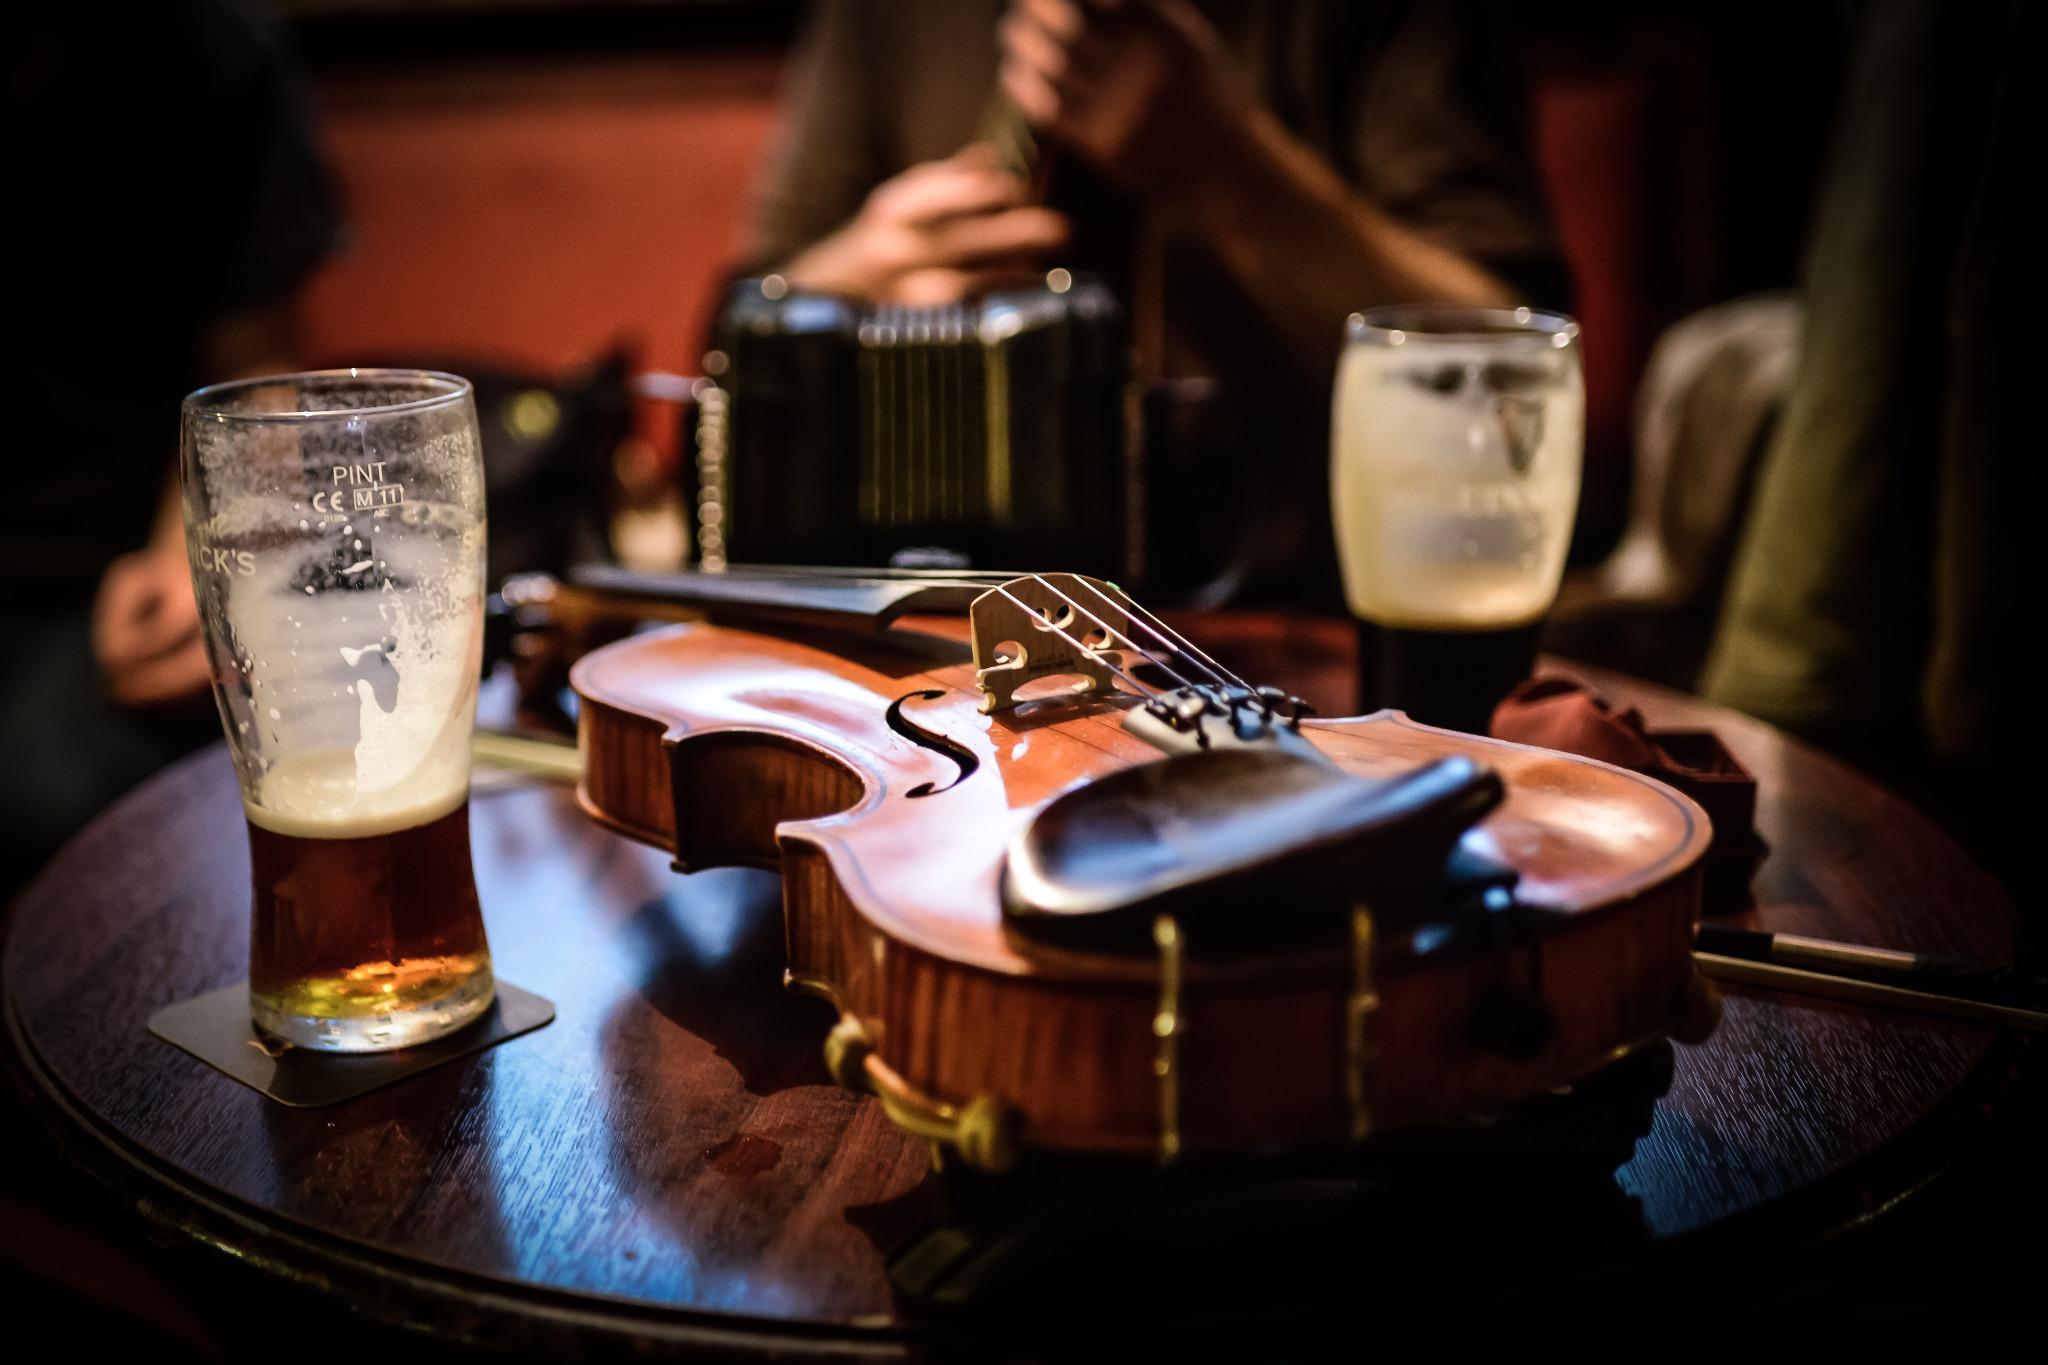 A violin on a table at an Irish pub.